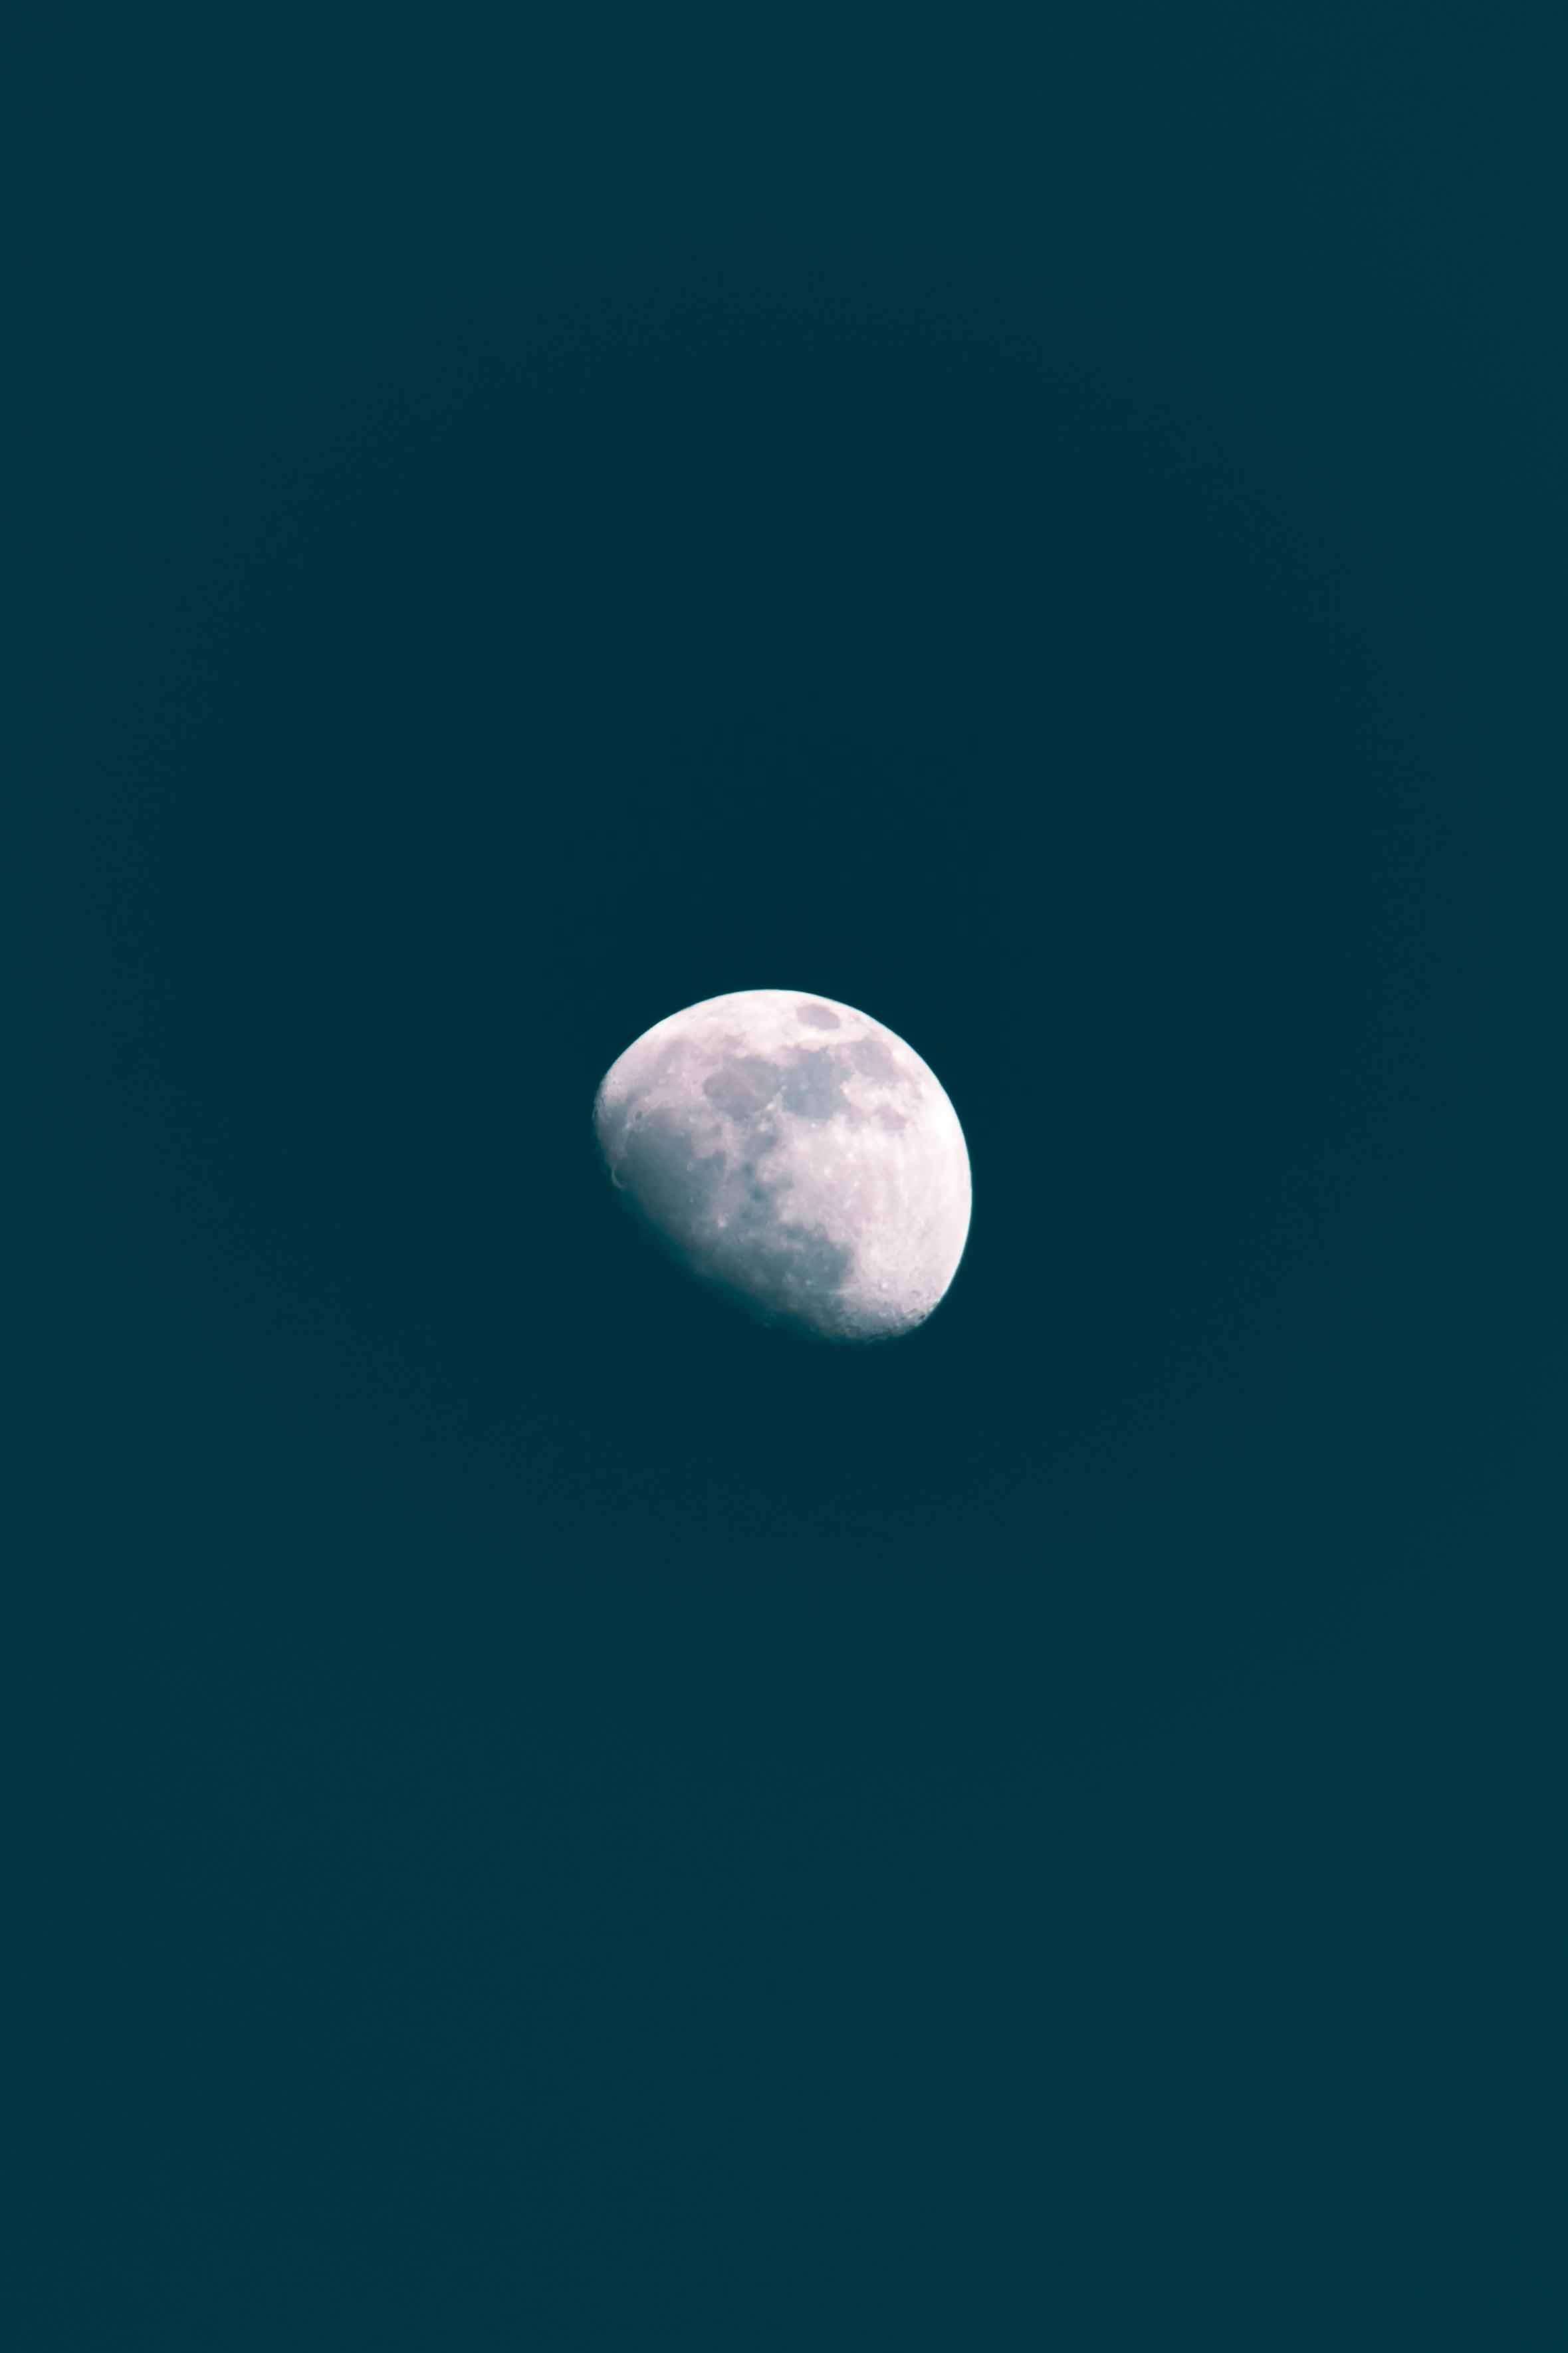 Lune-2-Ophelie-Delmarle-Photographe.jpg